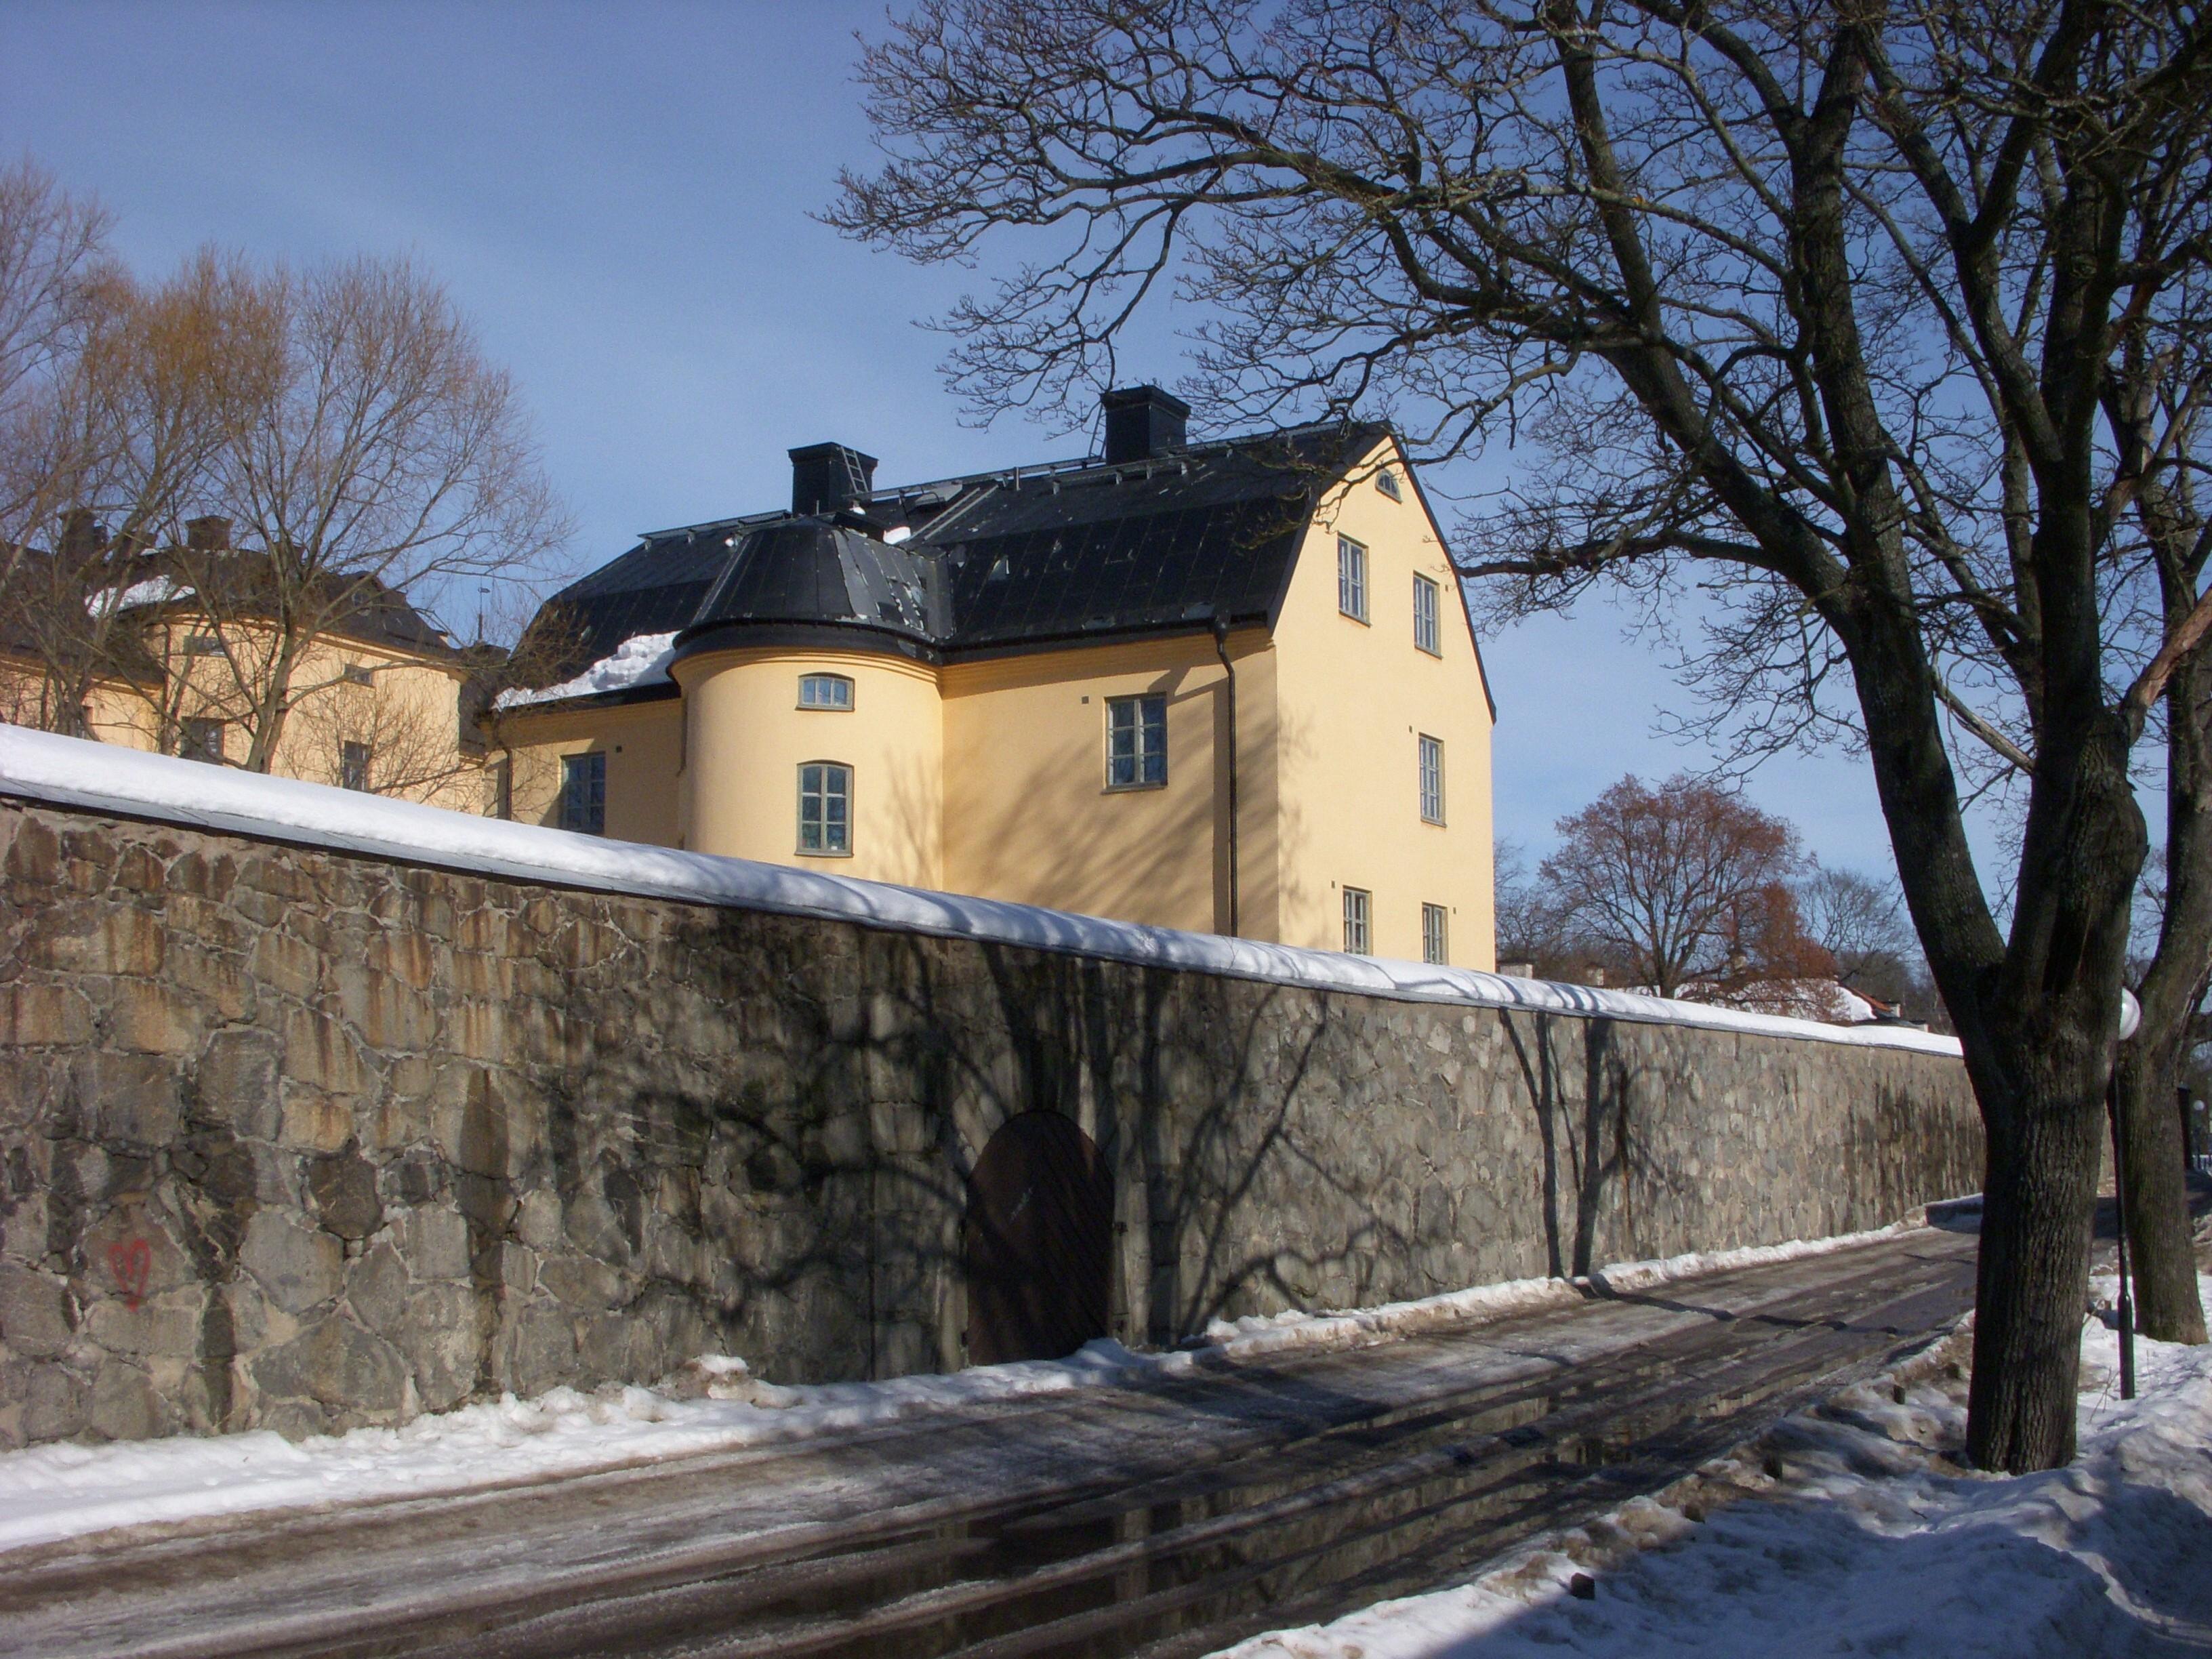 Riddarhuset%2C_L%C3%A5ngholmen_2010.jpg